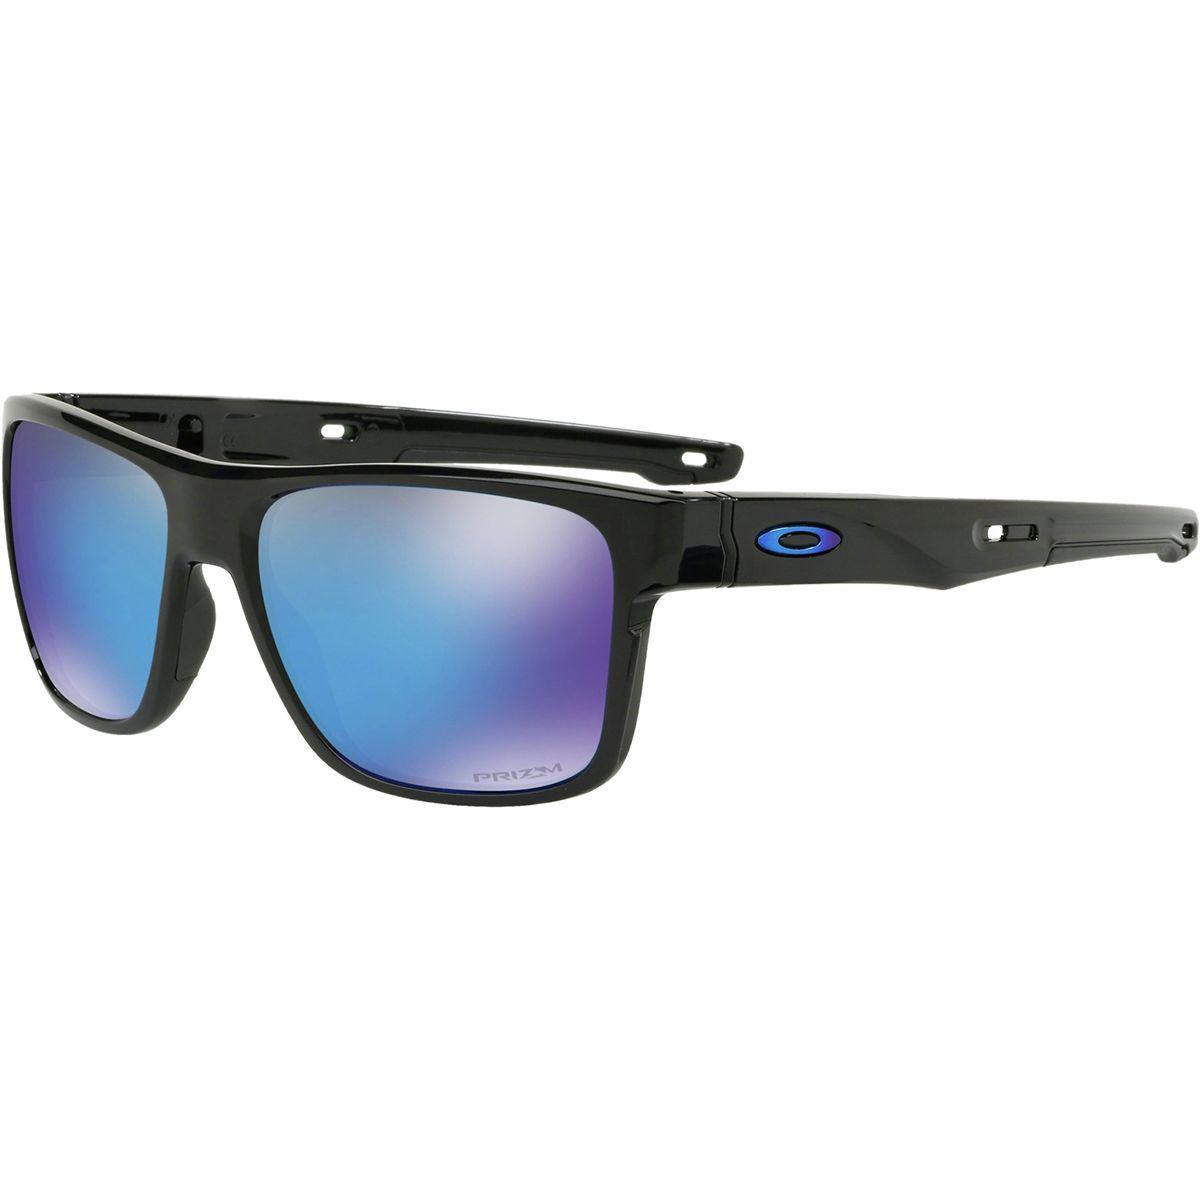 fe4a12e3e0 Lyst - Oakley Crossrange Prizm Sunglasses in Black for Men